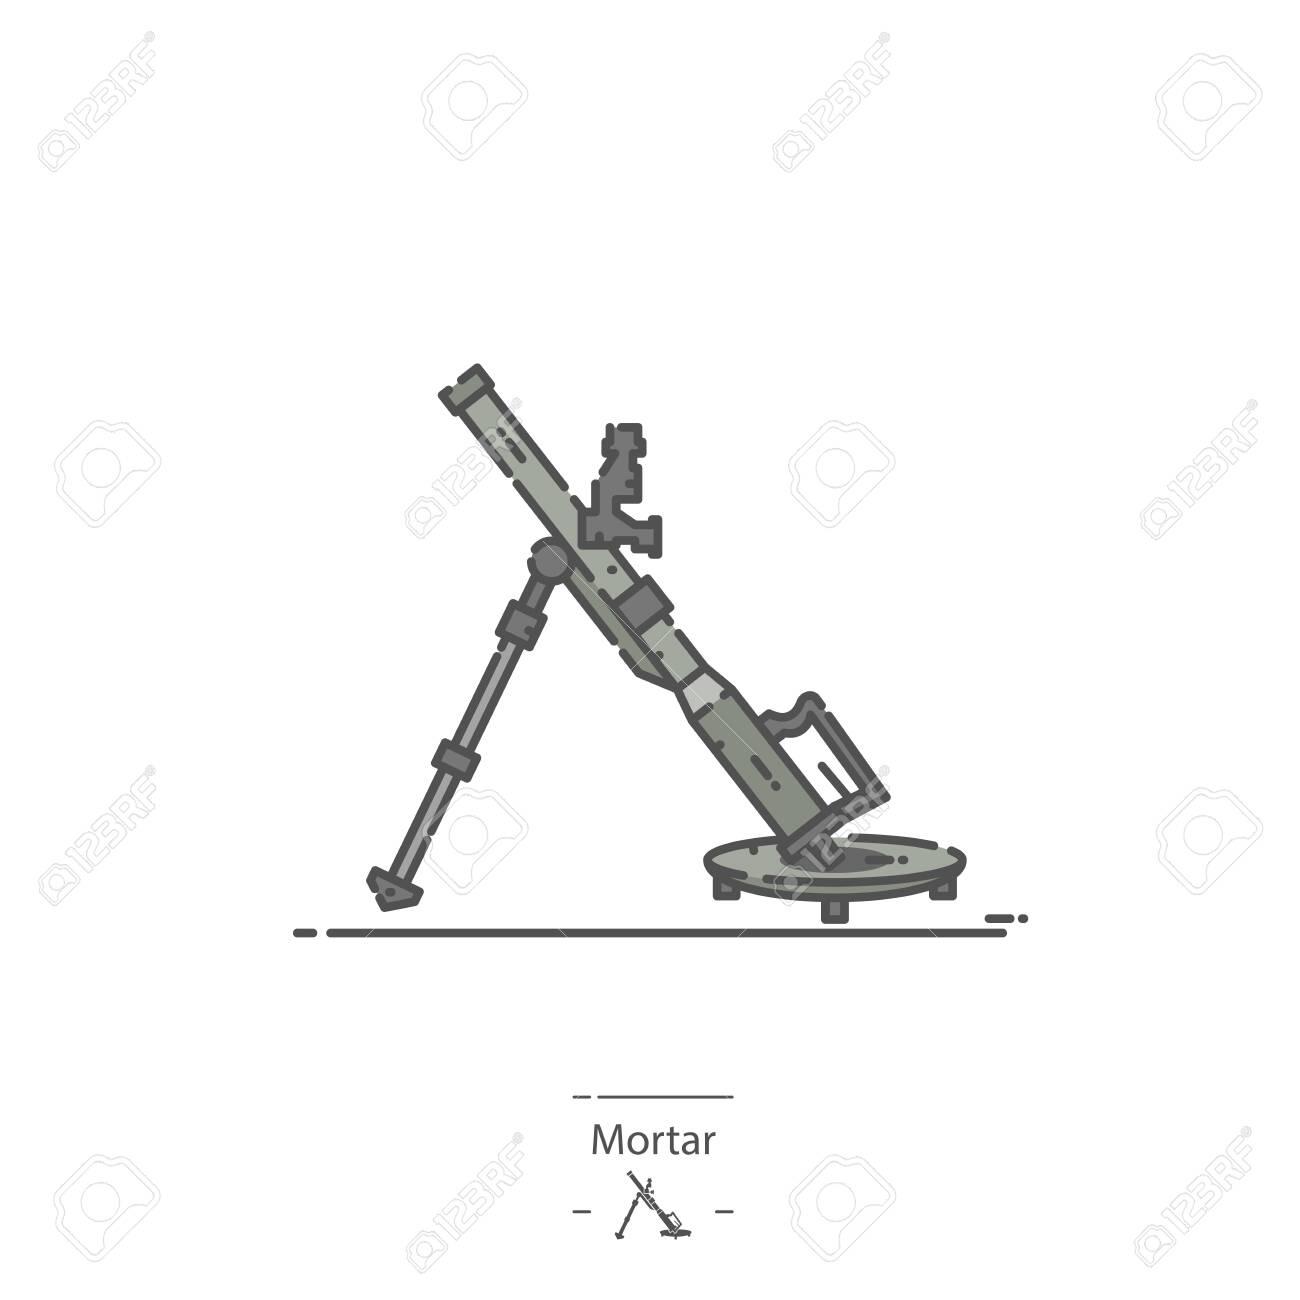 Military Mortar - Line color icon - 135053033